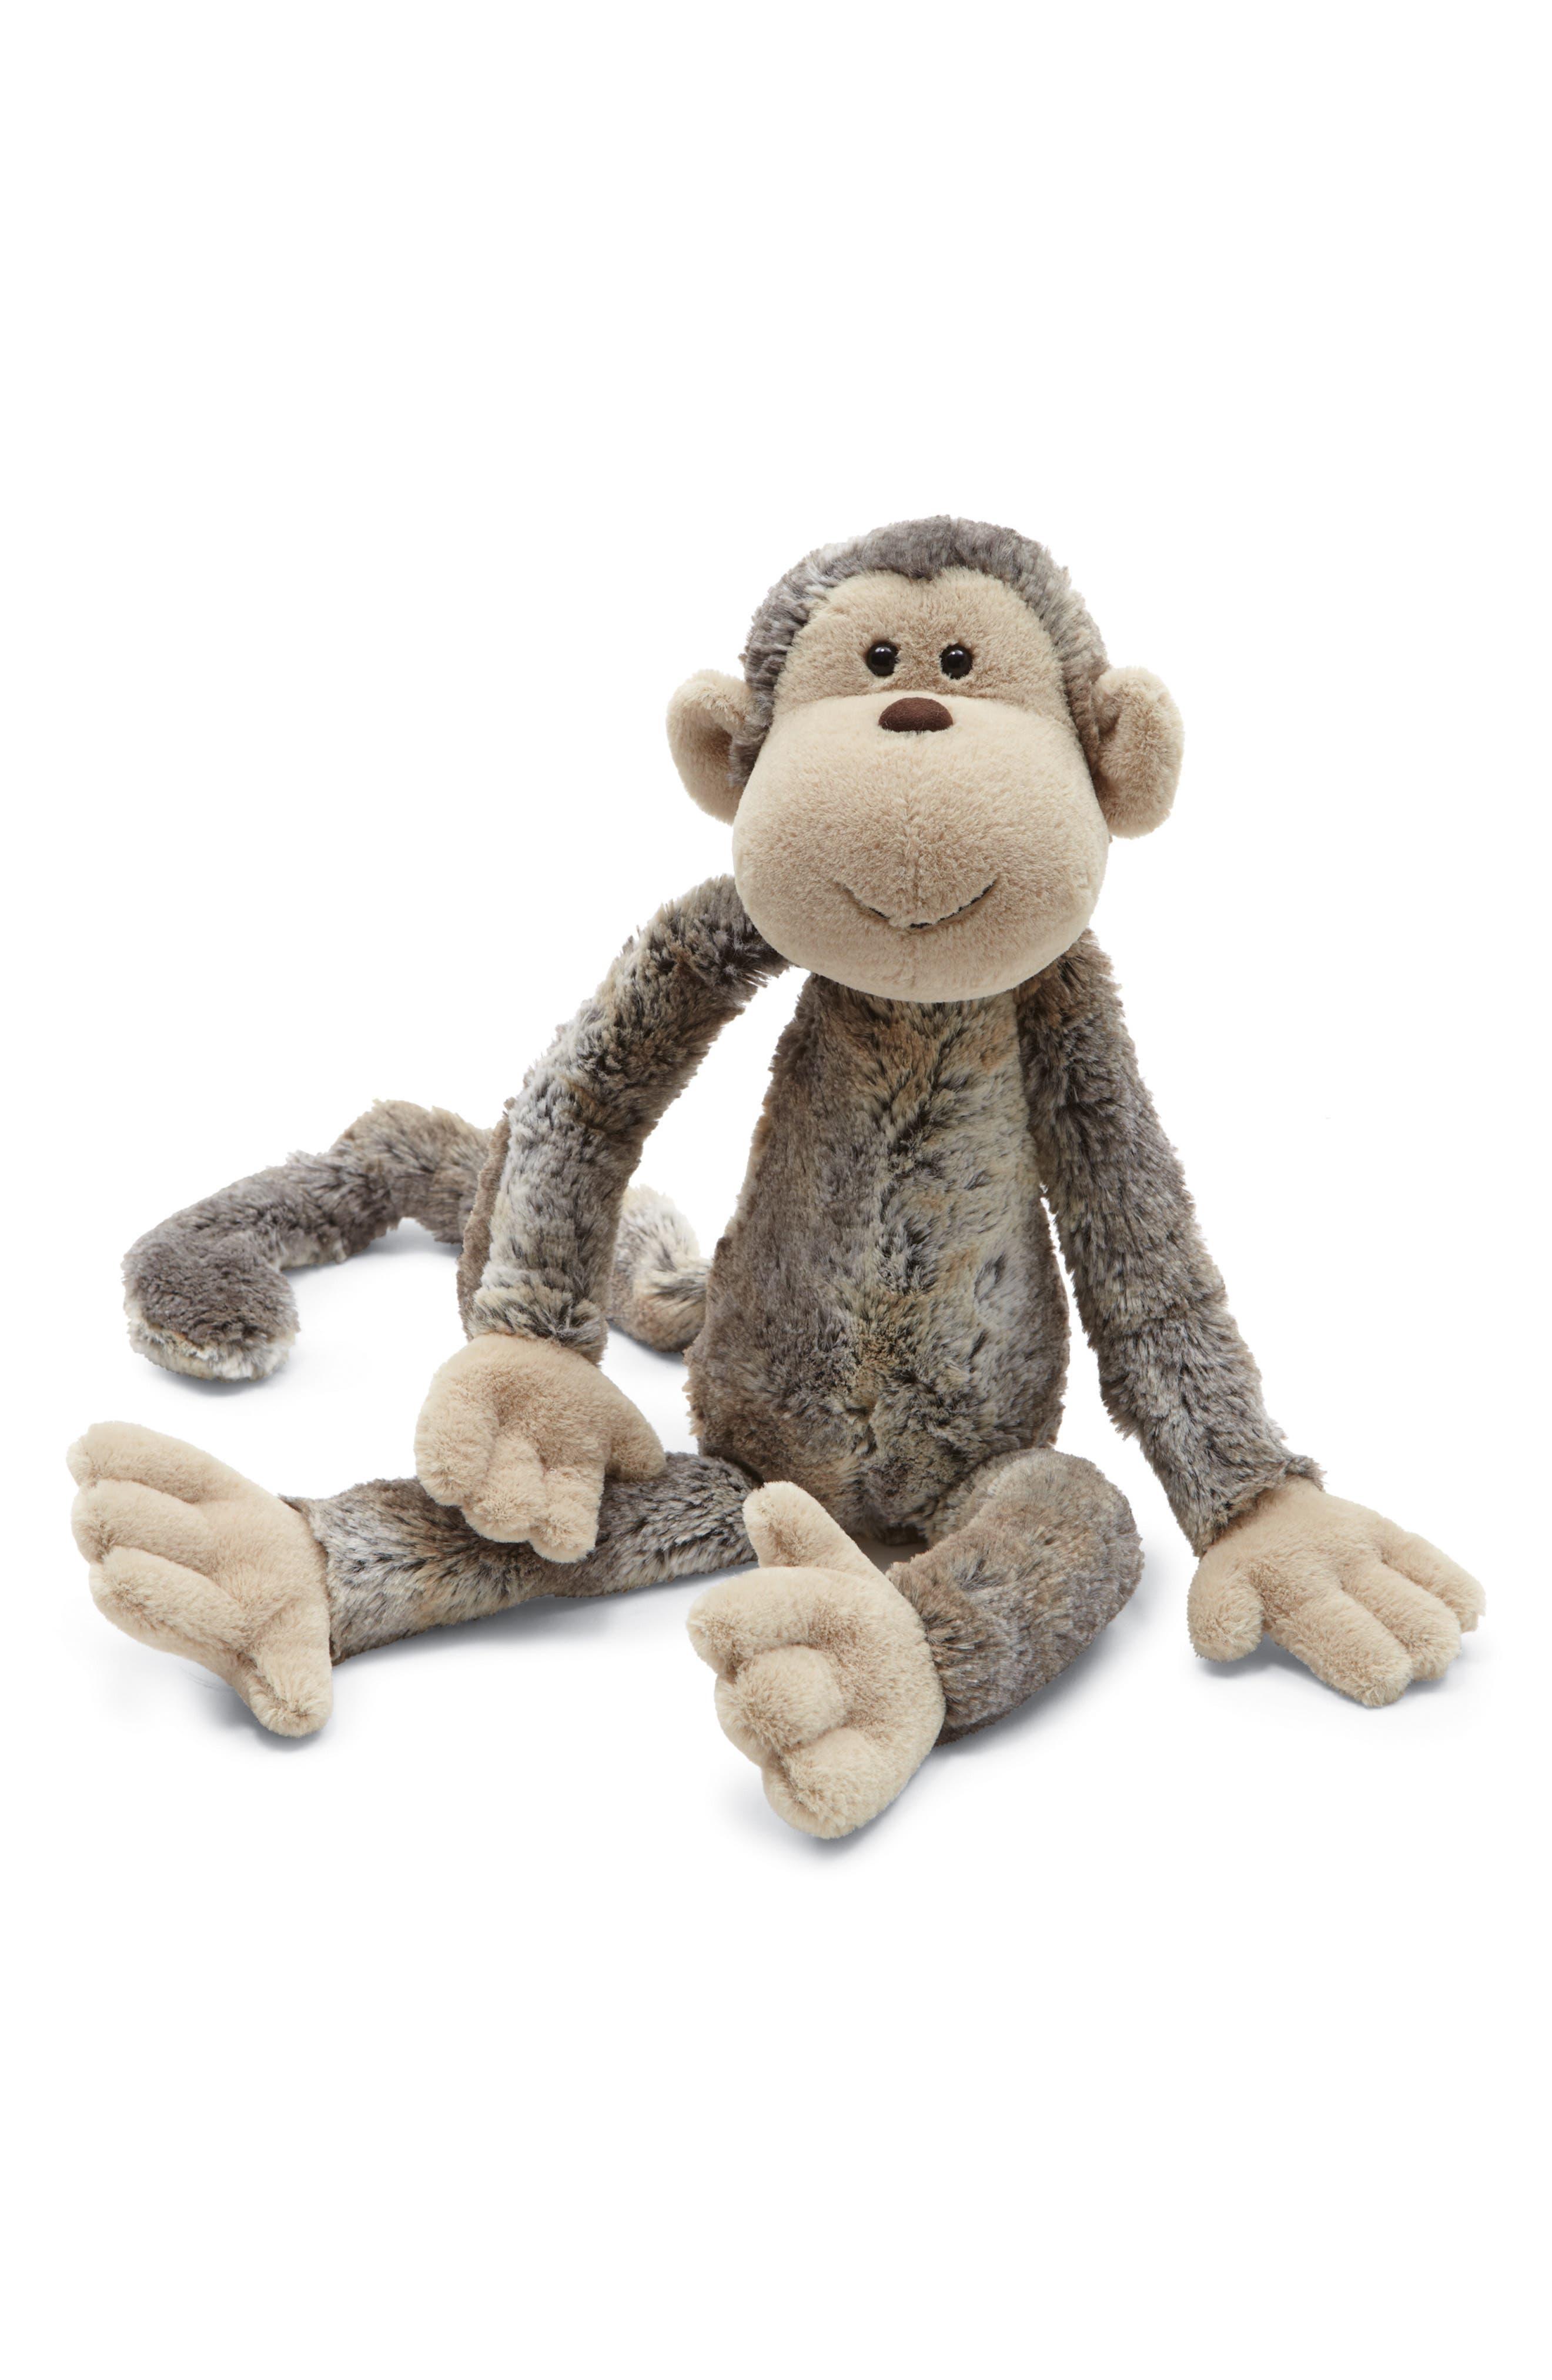 JELLYCAT 'Medium Mattie Monkey' Stuffed Animal